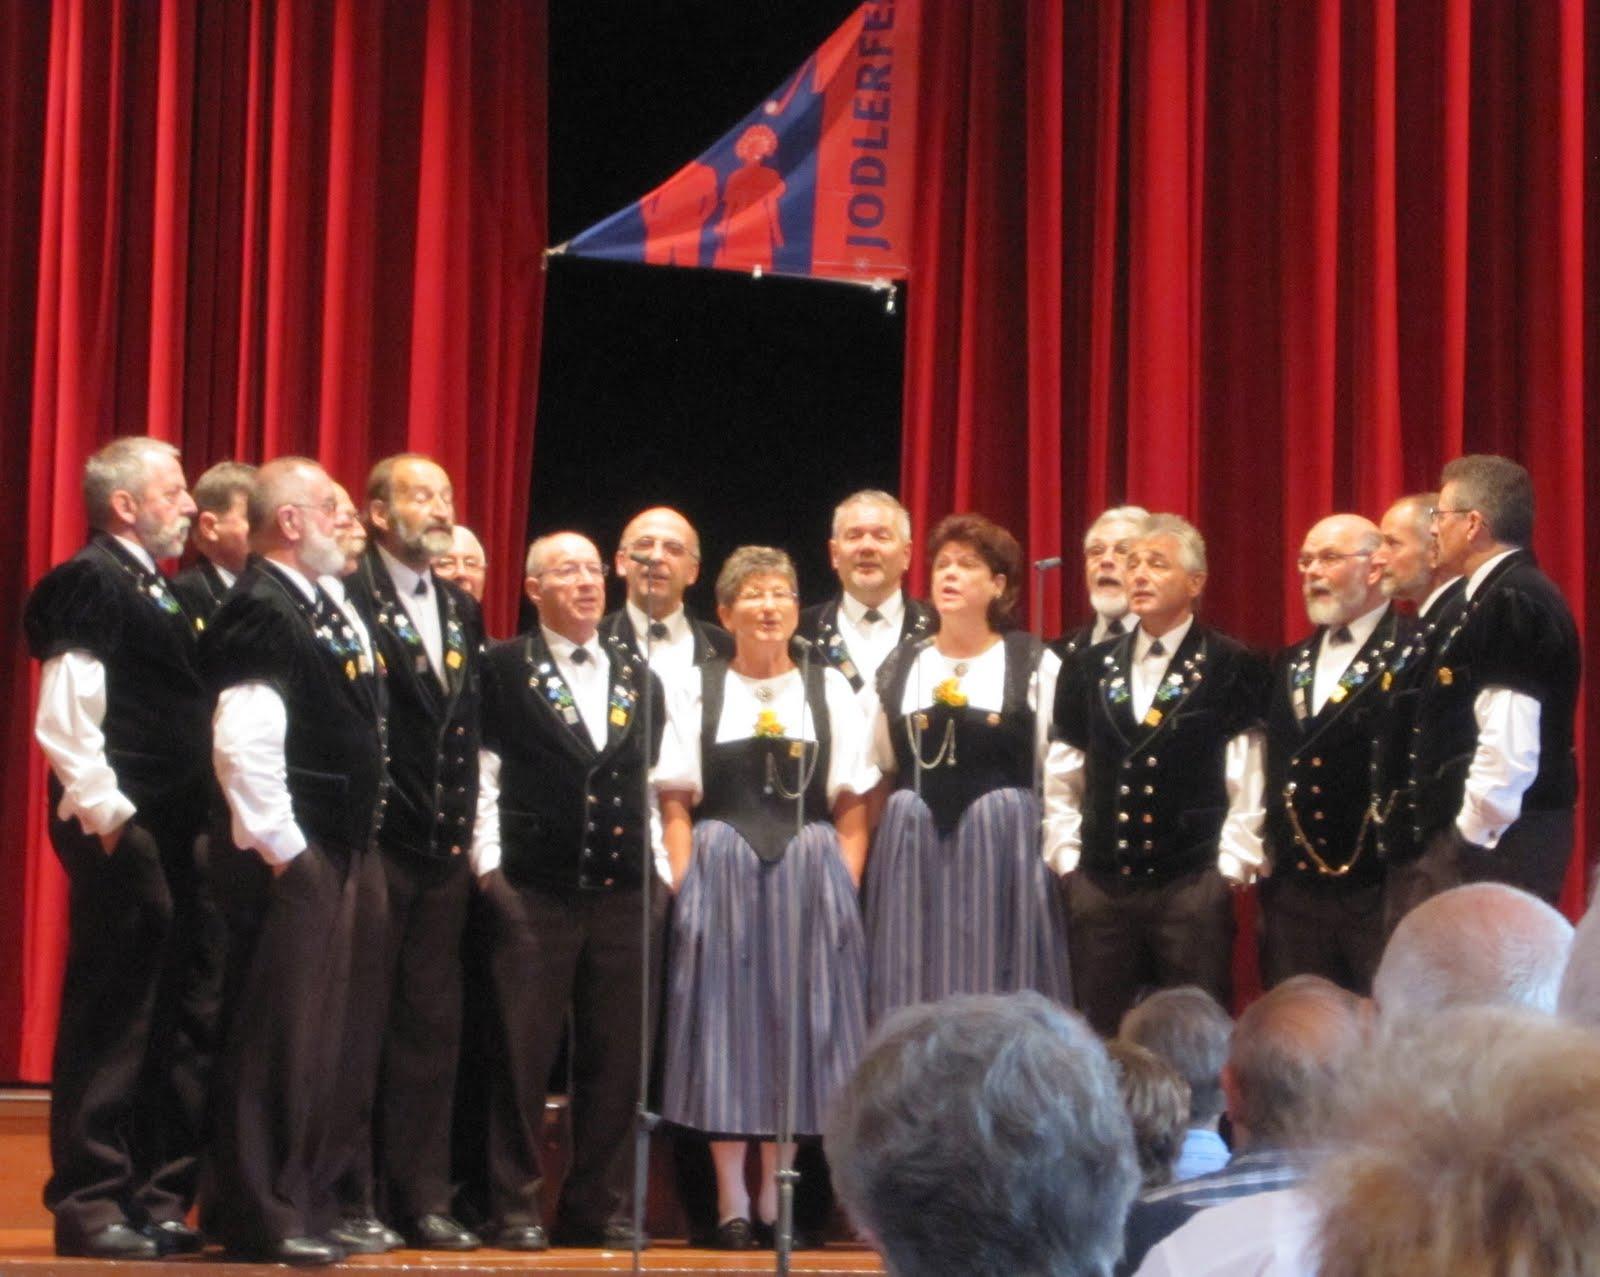 Trip To Paris Switzerland More Yodeling Fest Interlaken